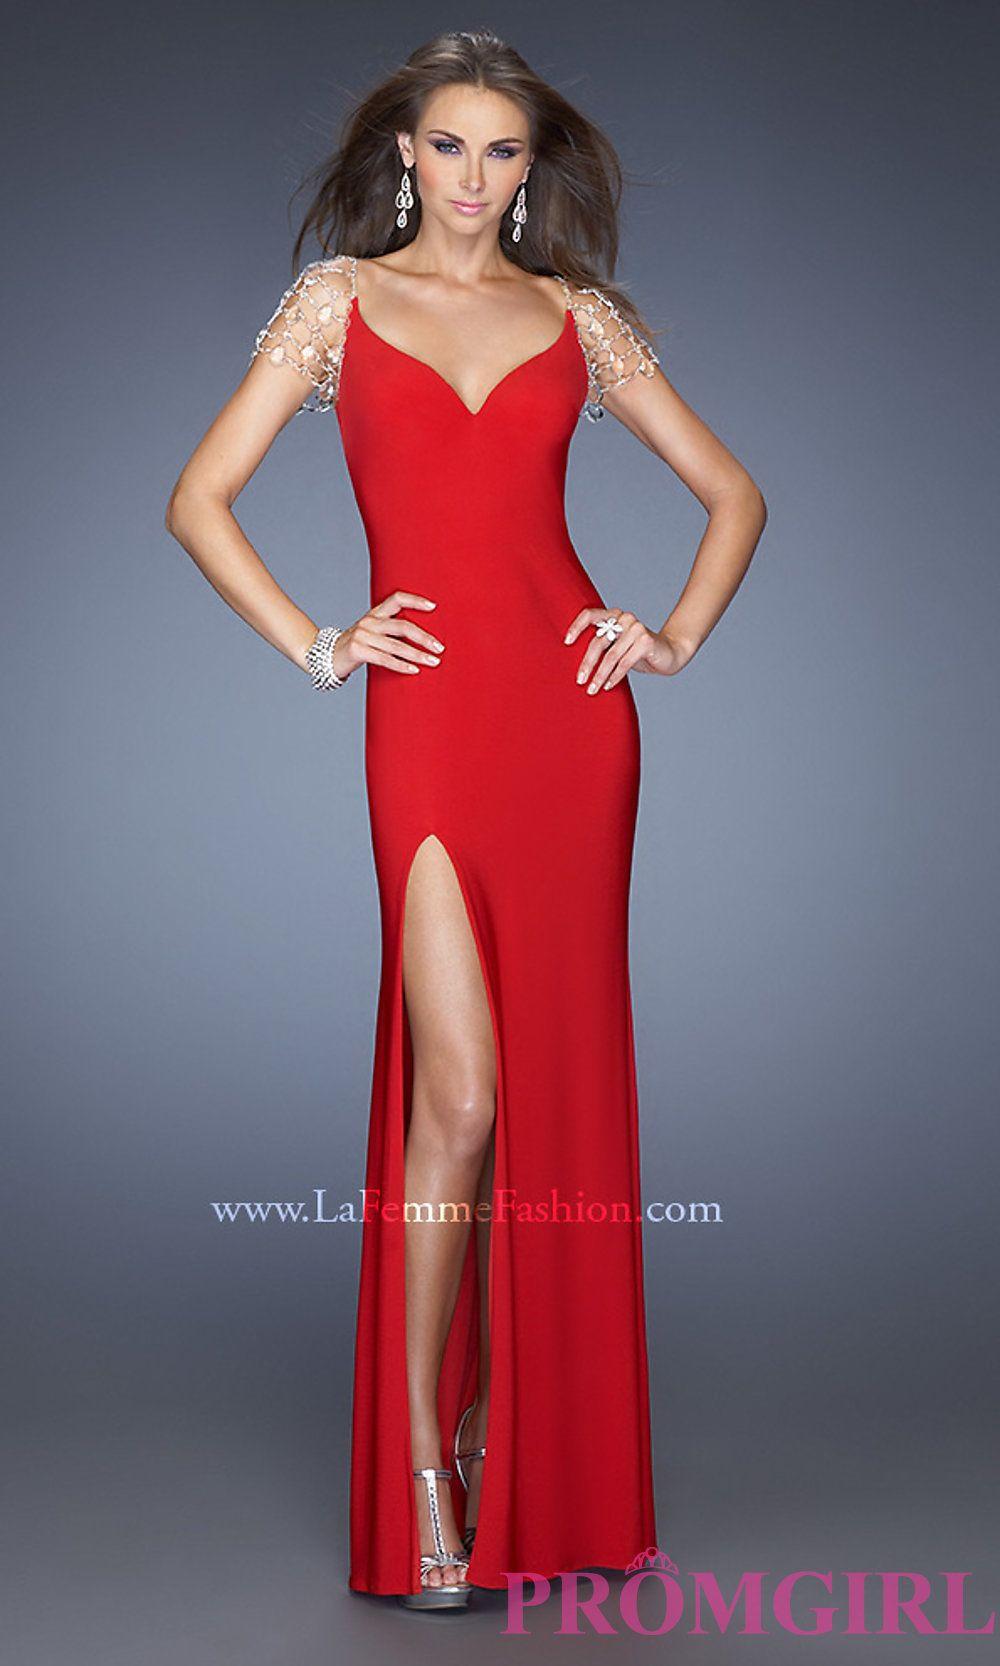 Long prom dress style lf front image dresses pinterest